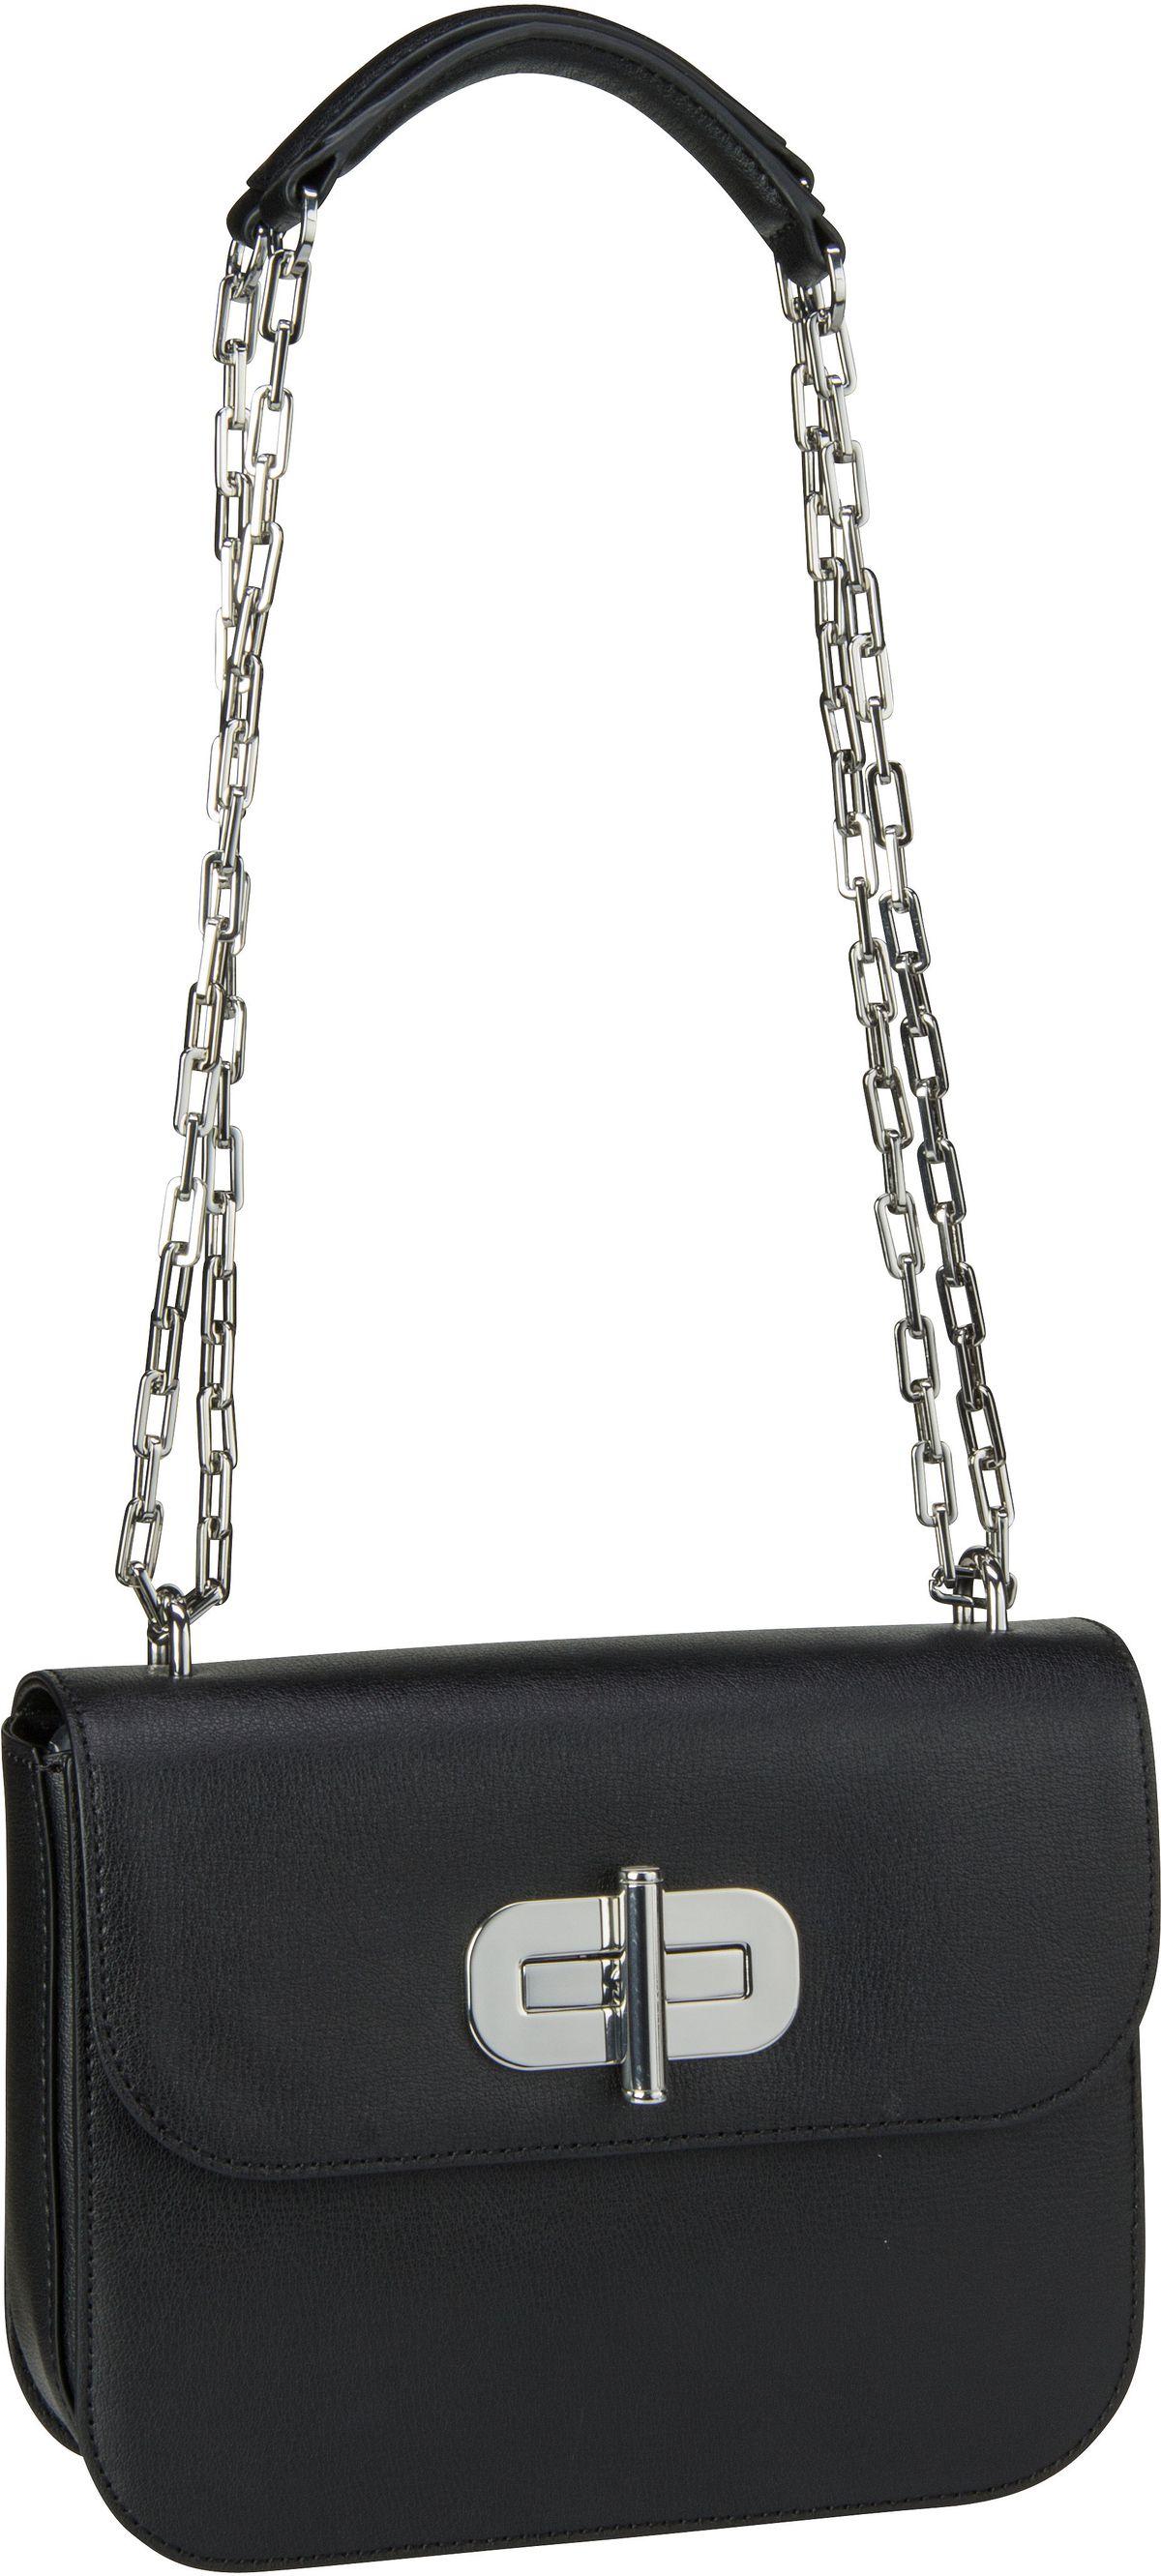 Handtasche Turnlock Crossover 7111 Black